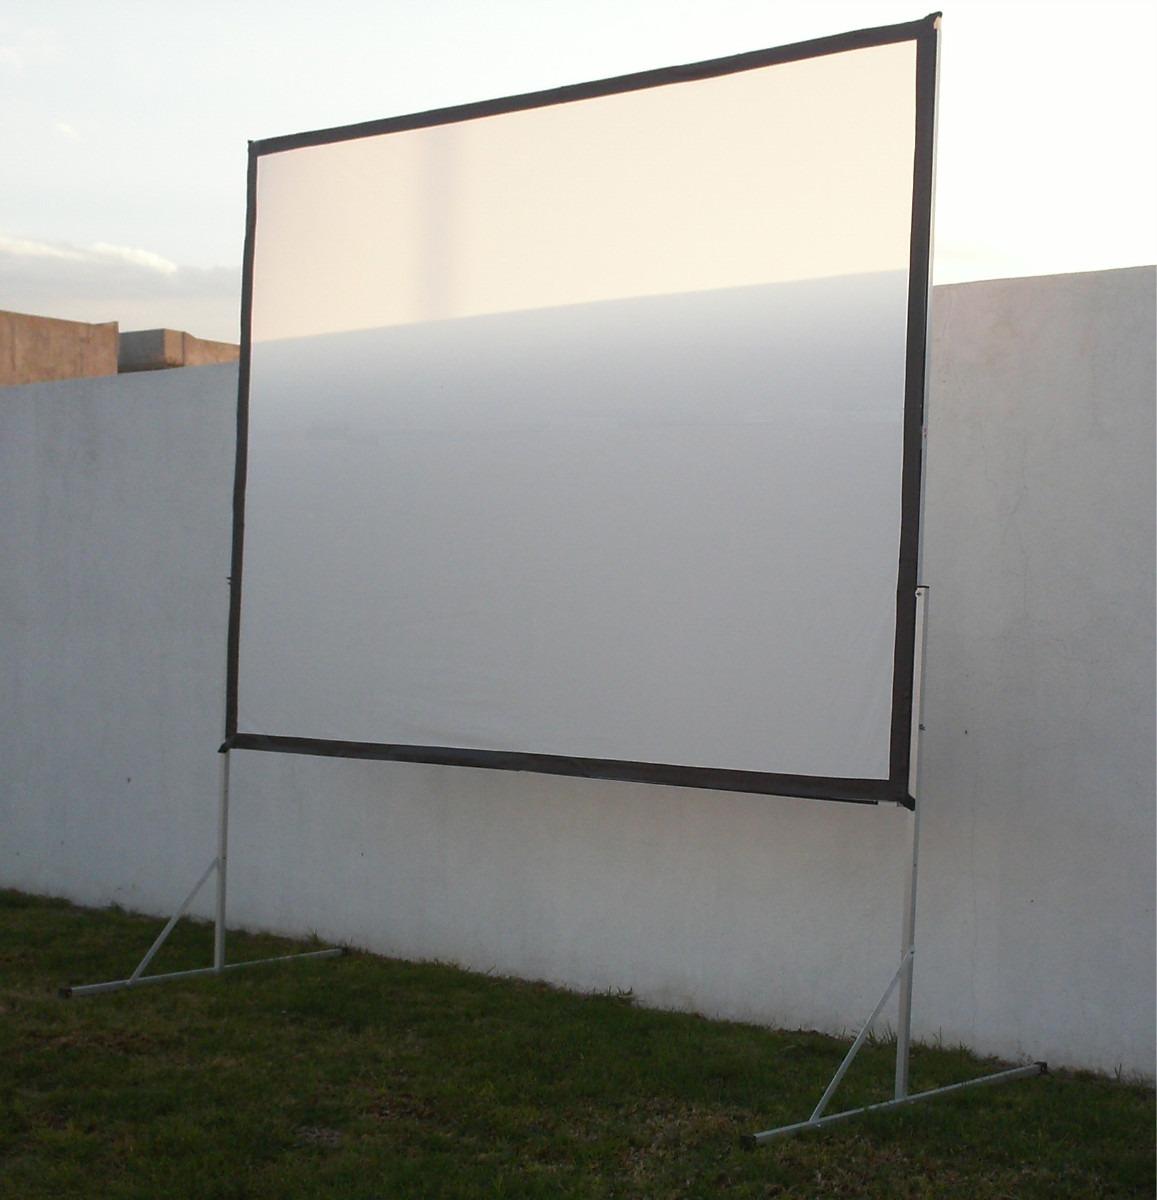 pantalla para proyeccion delantera o trasera marco de 3x2. Black Bedroom Furniture Sets. Home Design Ideas